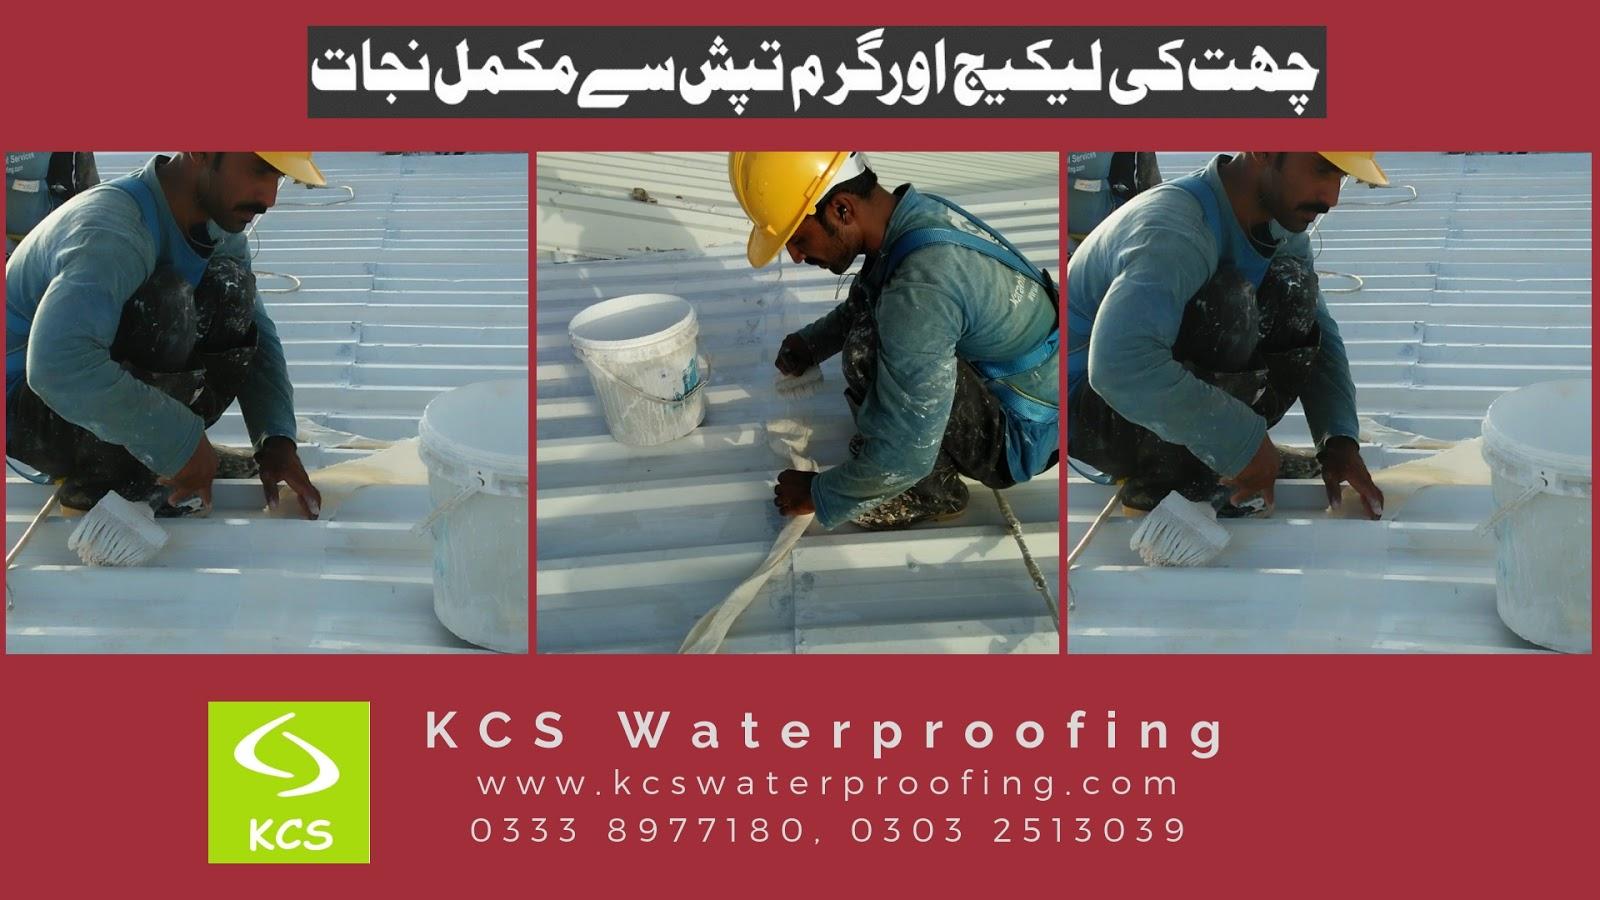 KCS - Waterproofing Services